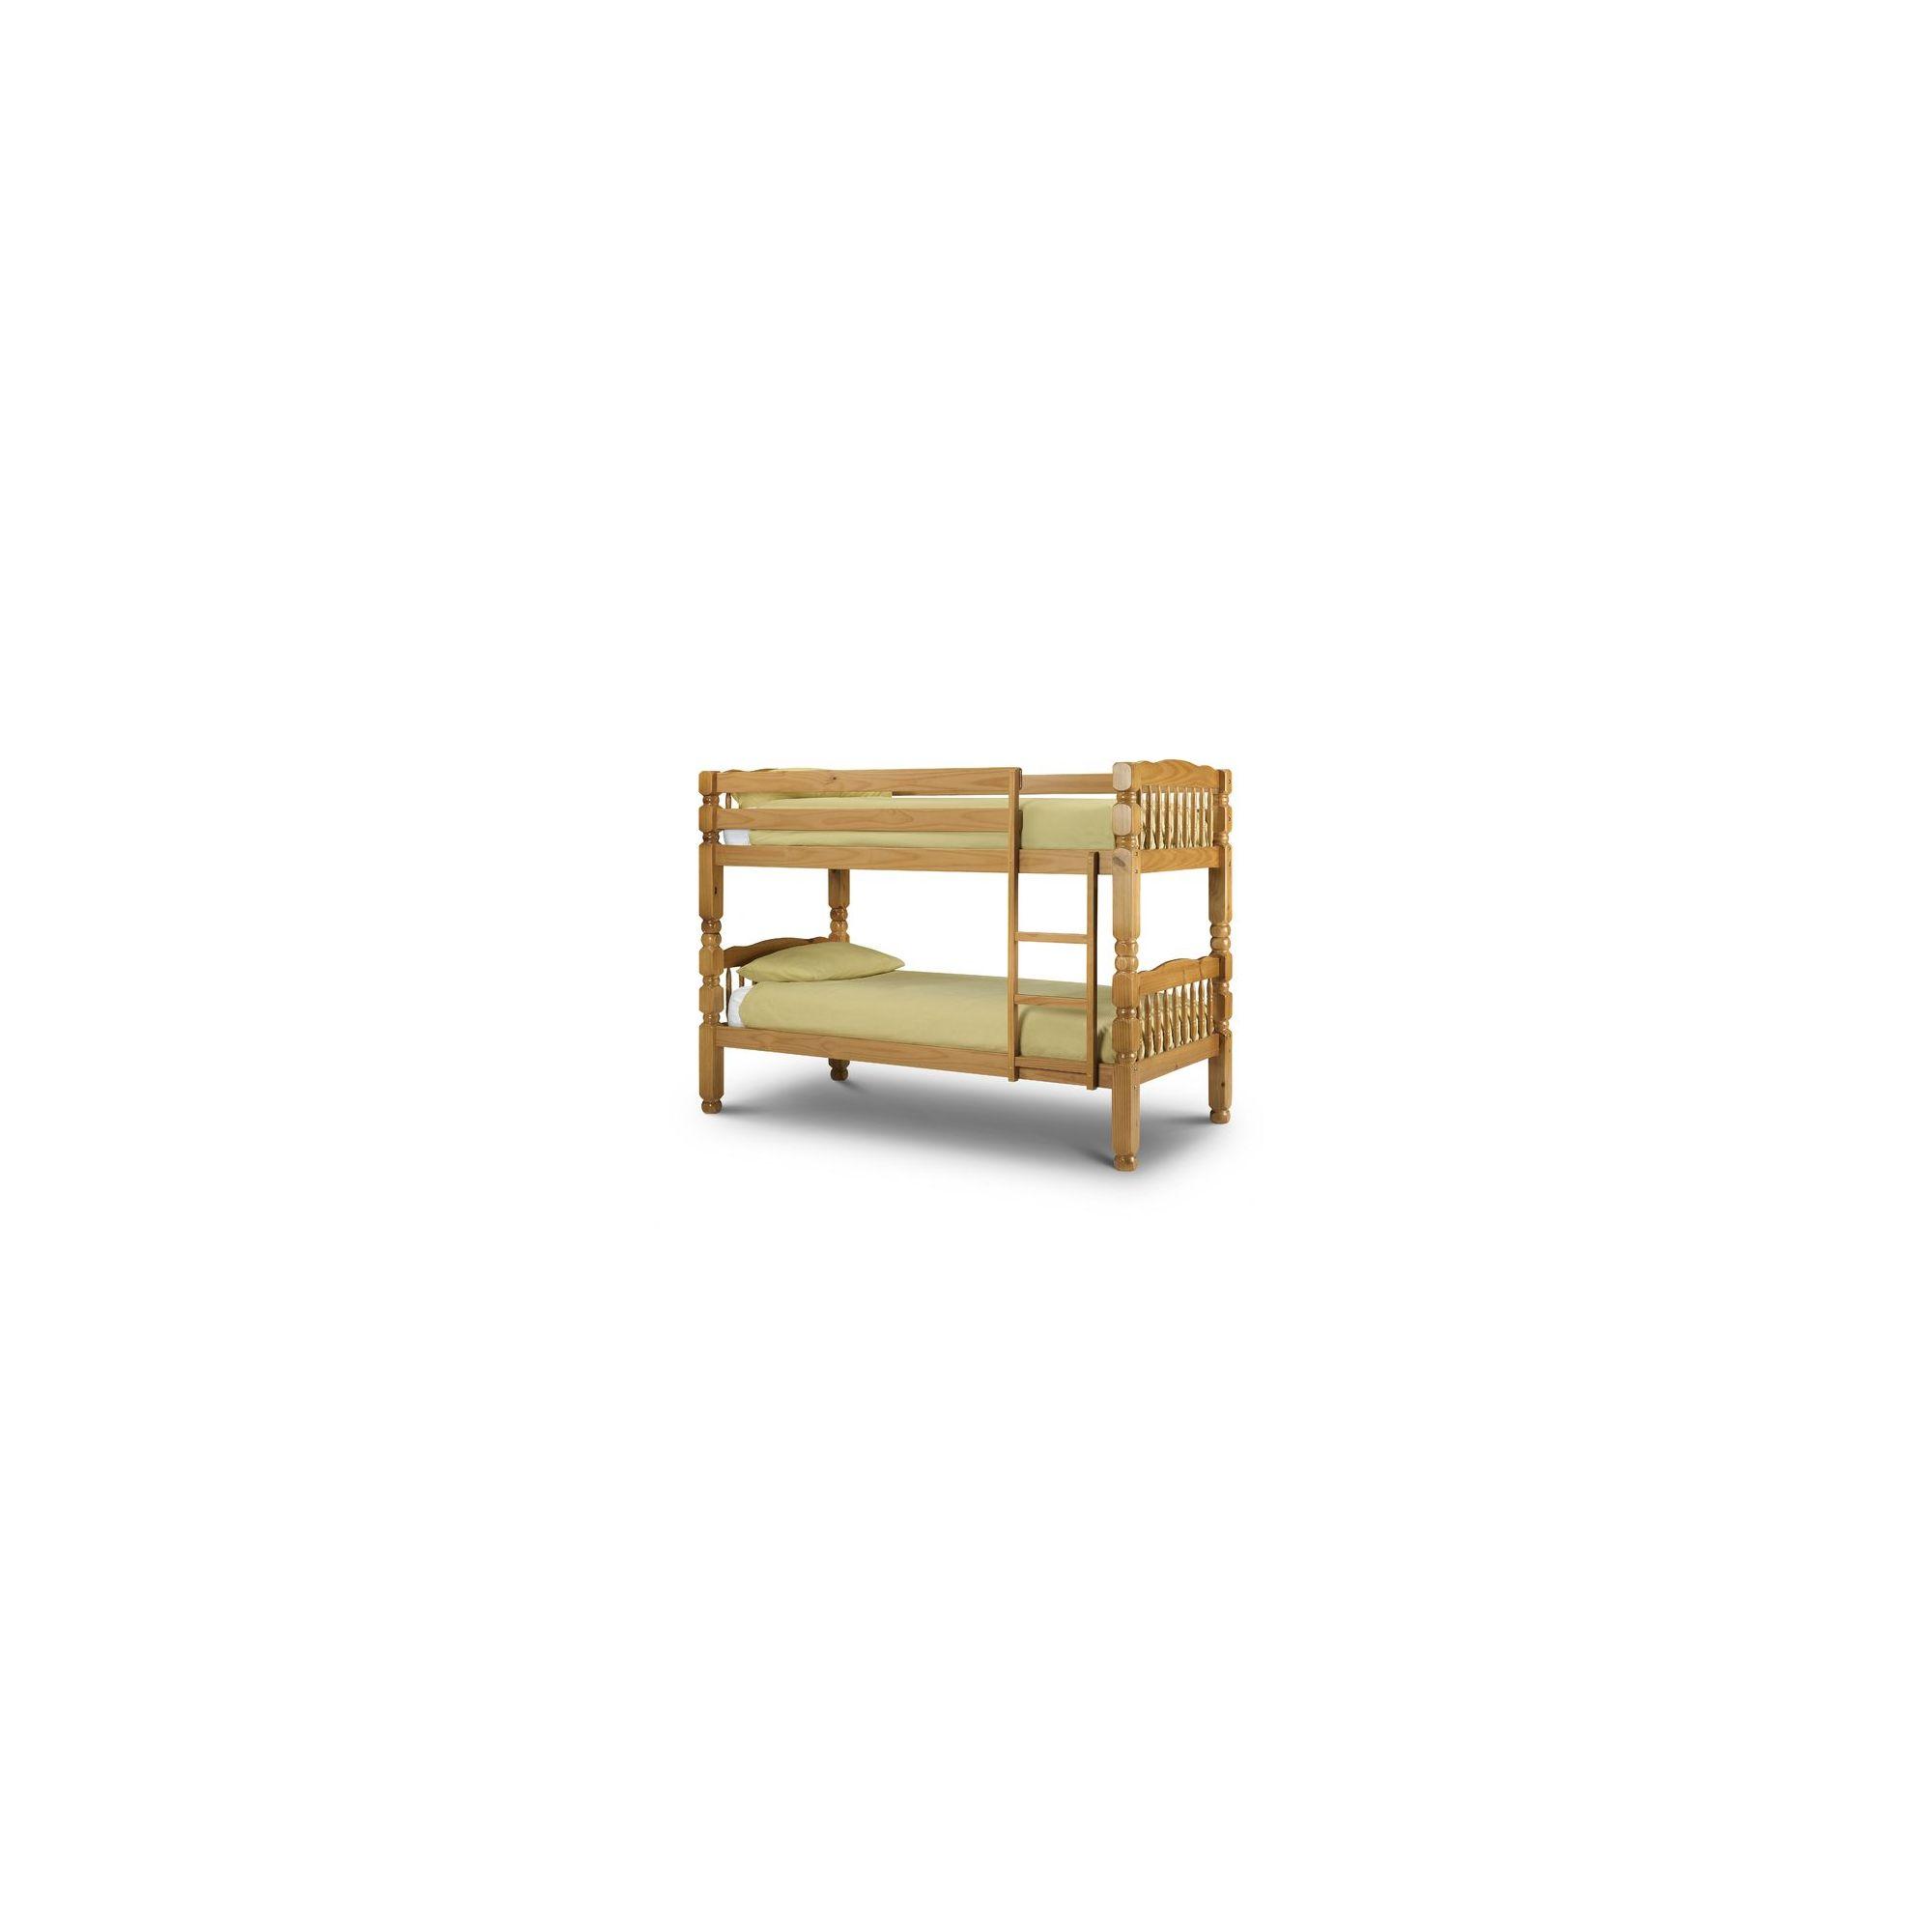 Julian Bowen Chunky Bunk Bed Frame at Tesco Direct